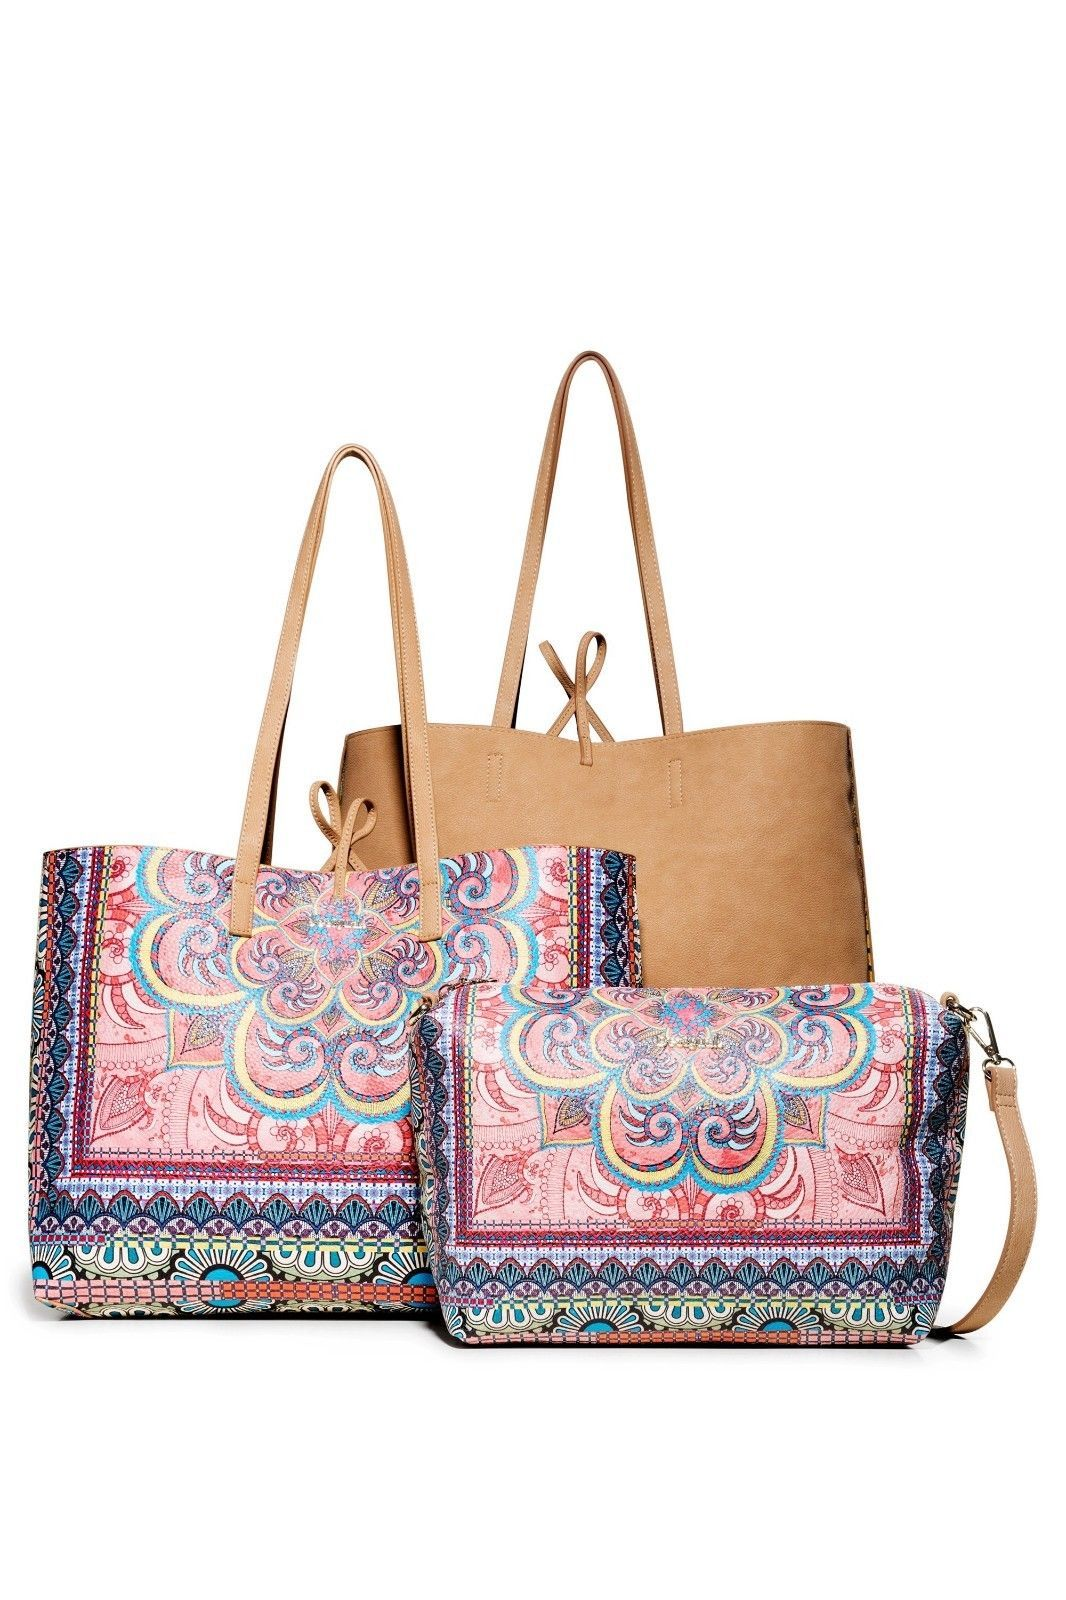 Desigual Vinland Seattle Bag Ebay